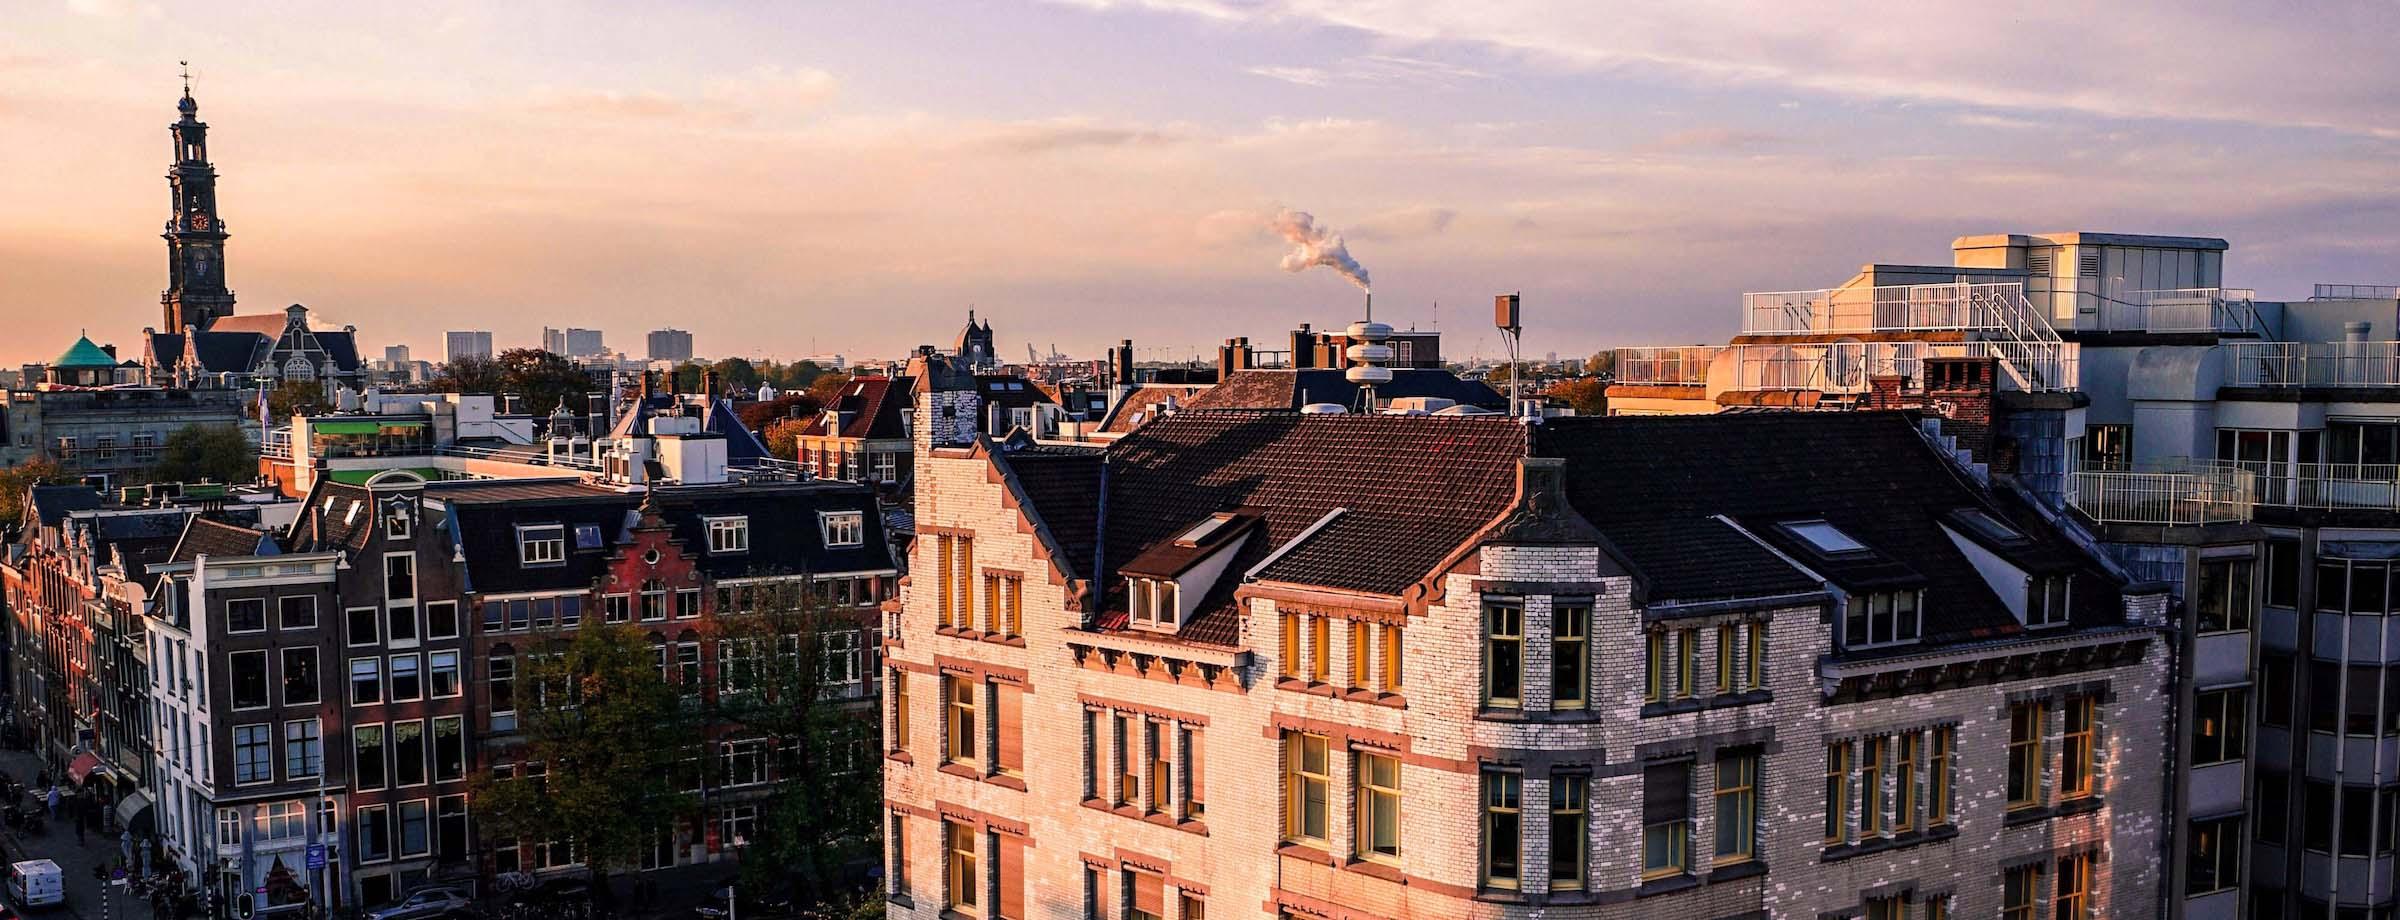 Amsterdam, by Simone Mascellari